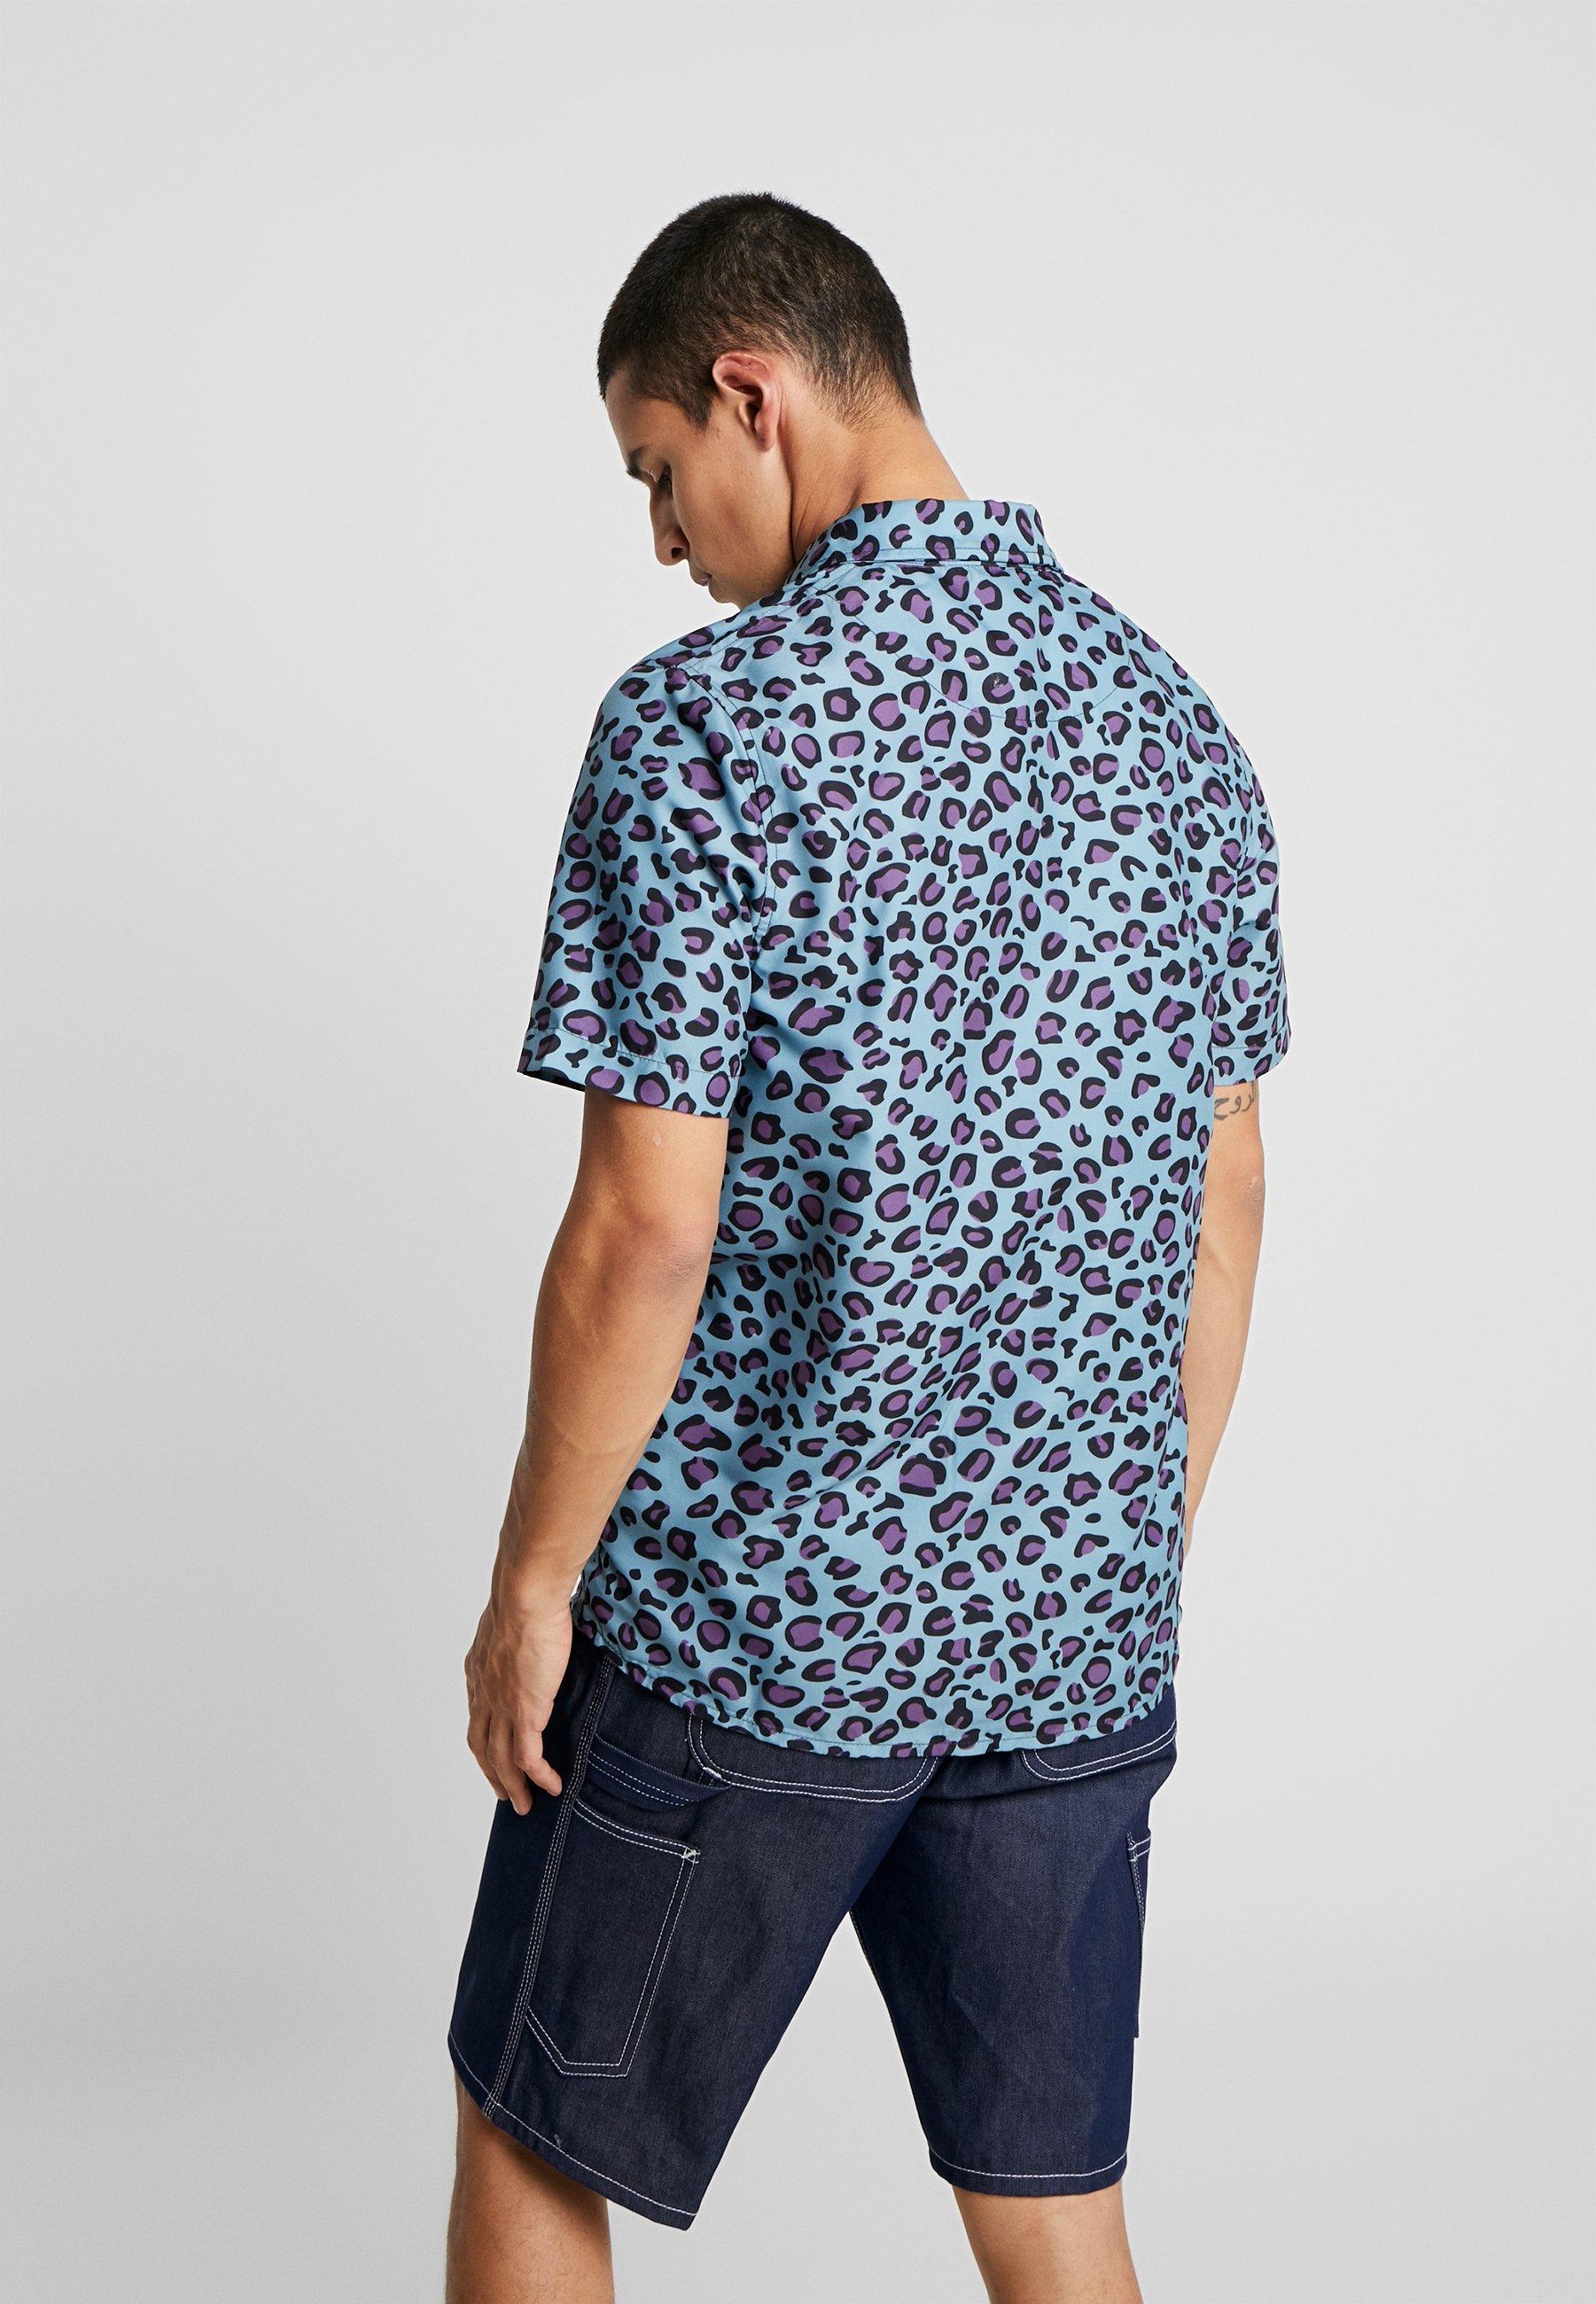 Mint Sons Sleeve Leopard Cayleramp; ShirtChemise Short Fresh BrCWQedxo